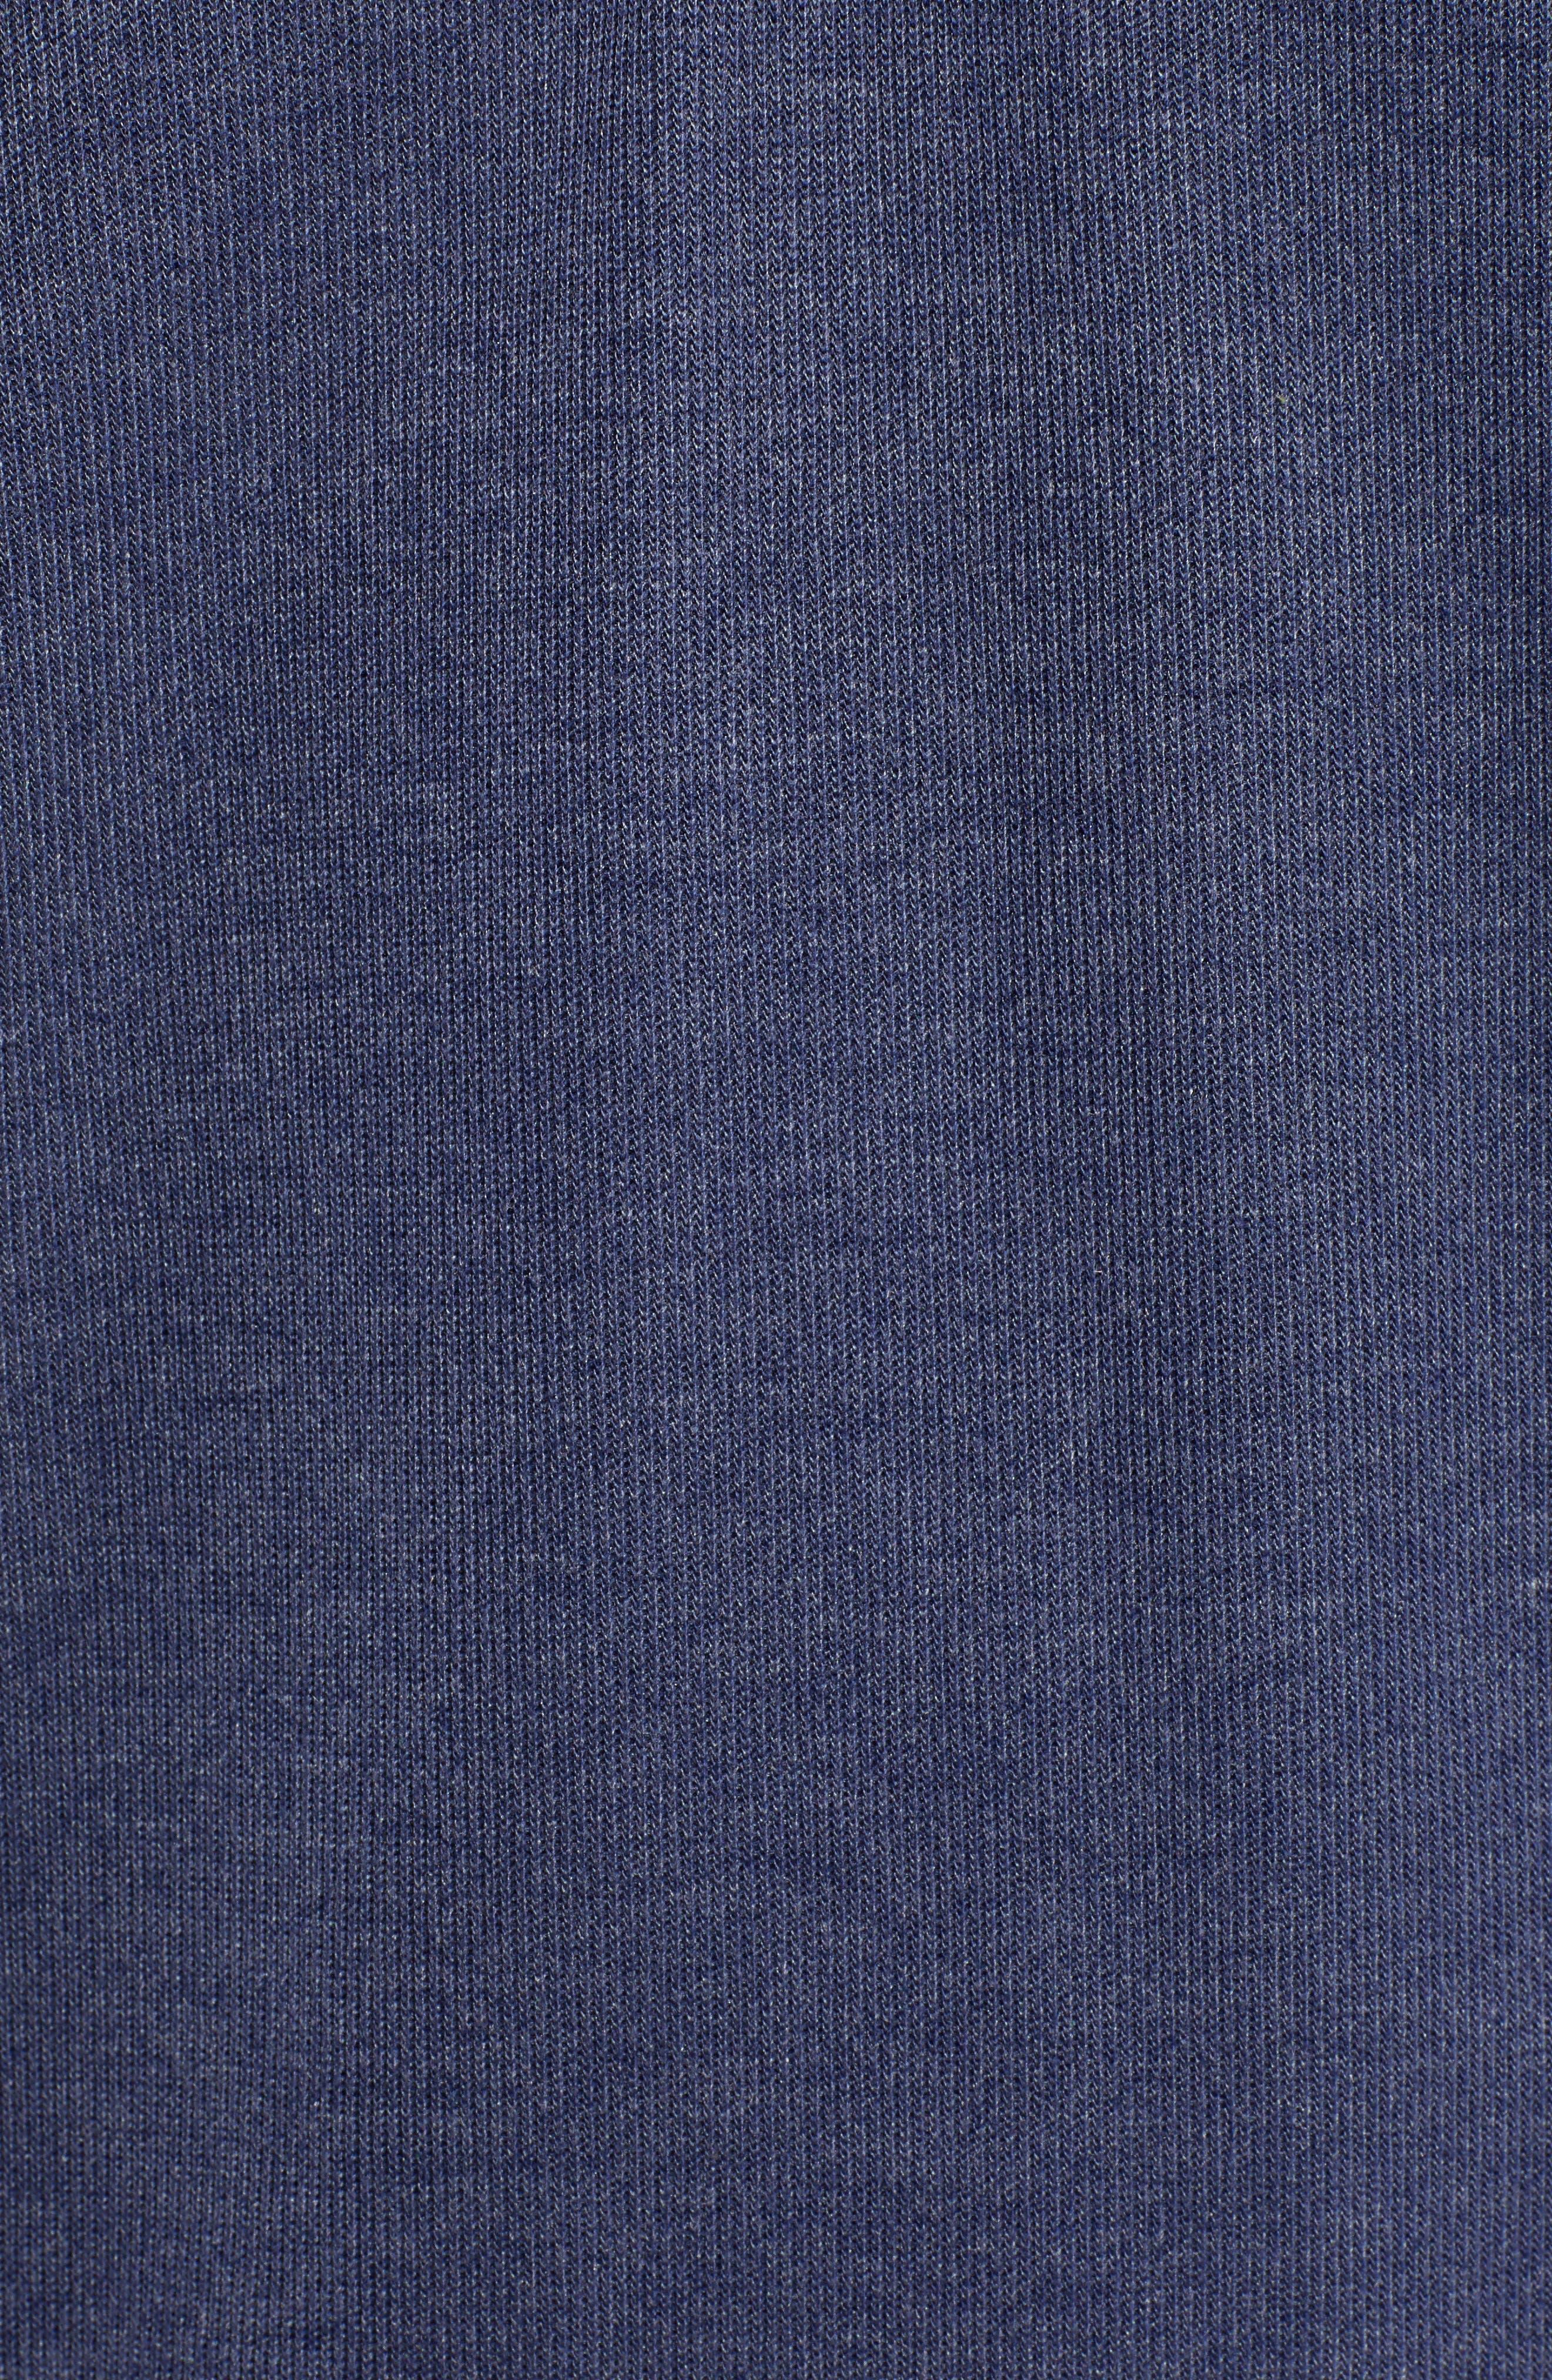 Sideline Quarter Zip Pullover,                             Alternate thumbnail 5, color,                             OCEAN DEEP